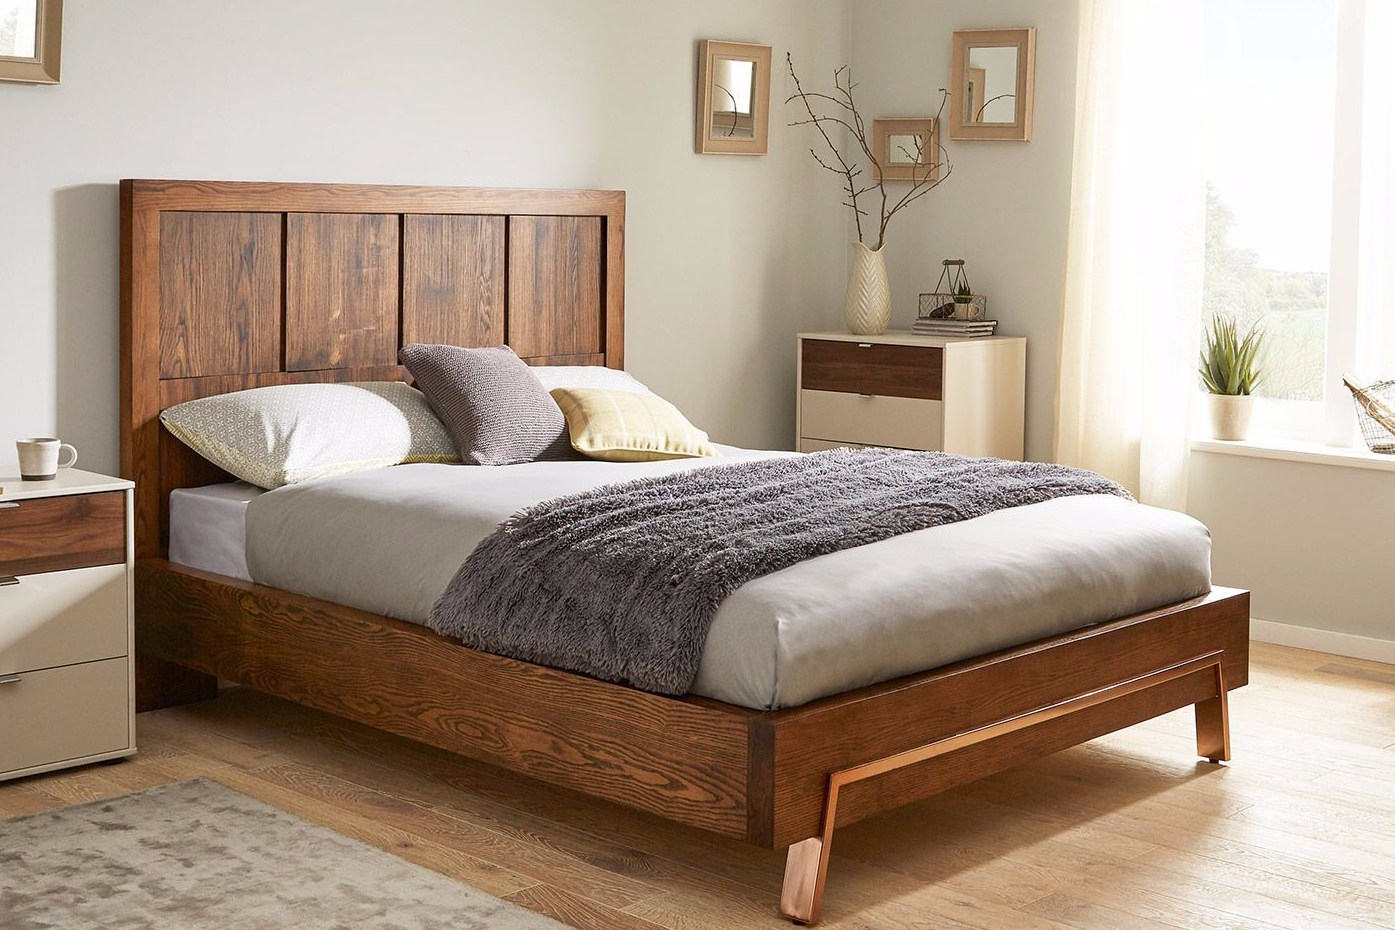 Model Tempat Tidur Kayu Jati